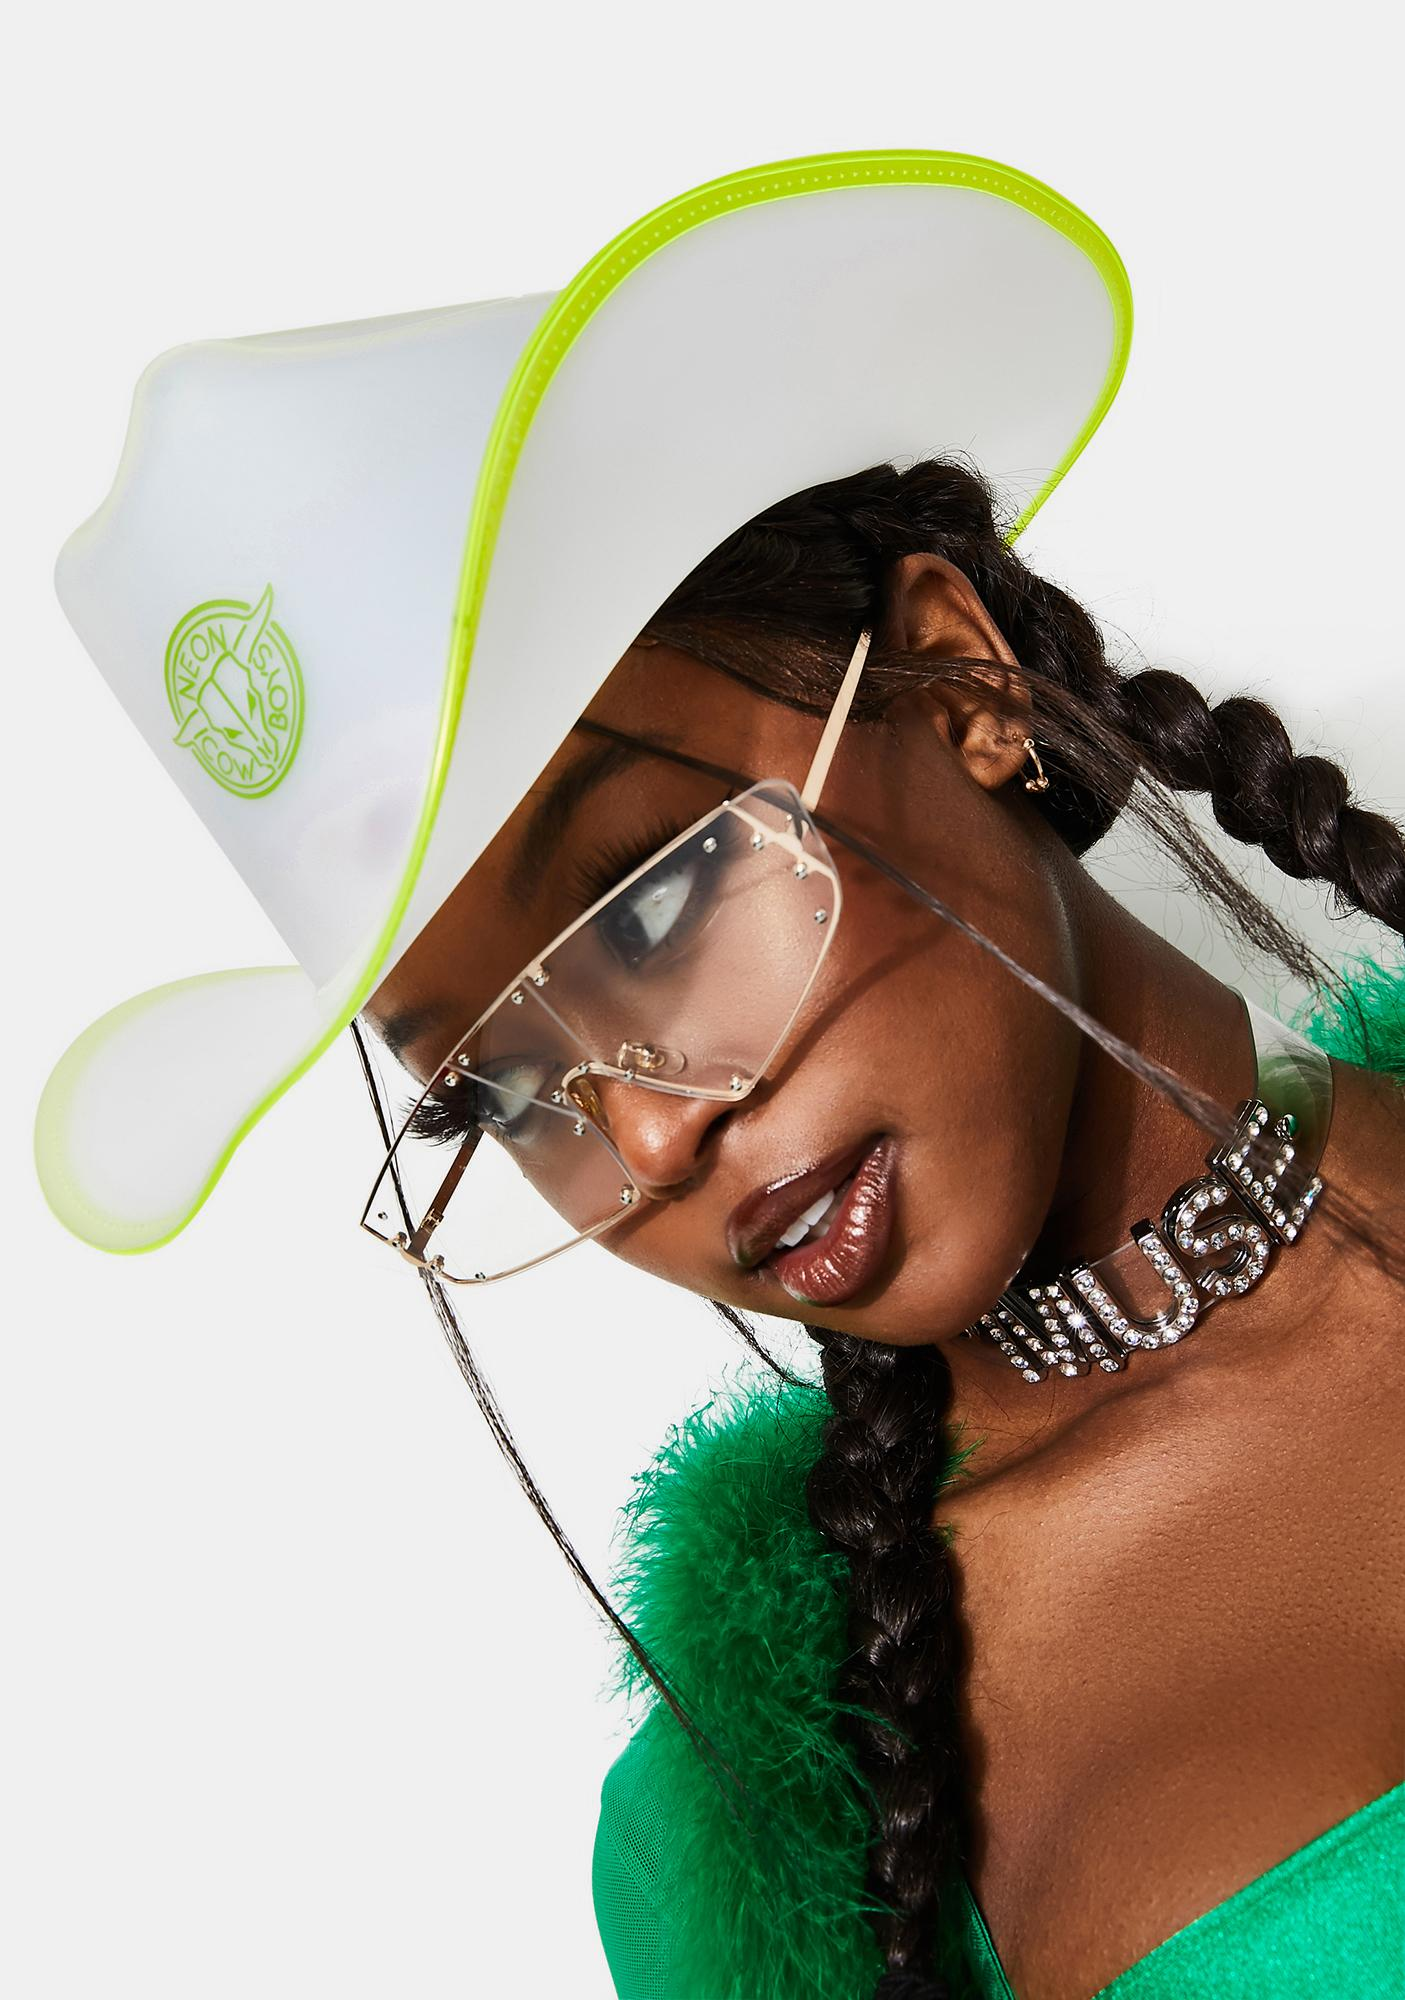 Neon Cowboys Green Trim Light Up Neon Cowboy Hat